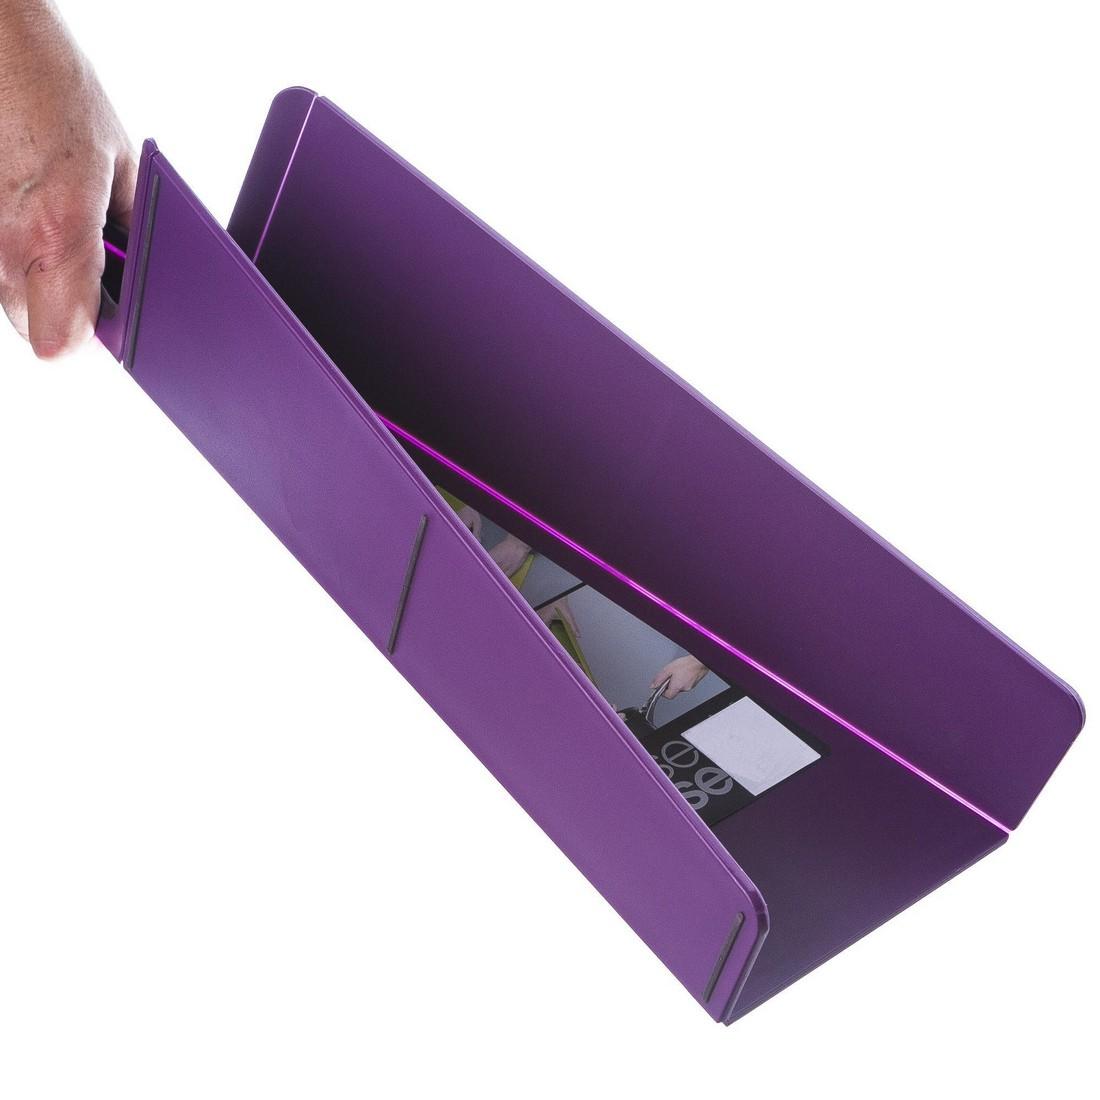 Schneidebrett Chop2Pot Plus – Kunststoff – Violett – 1 x 27 x 48 cm, JOSEPH JOSEPH günstig bestellen